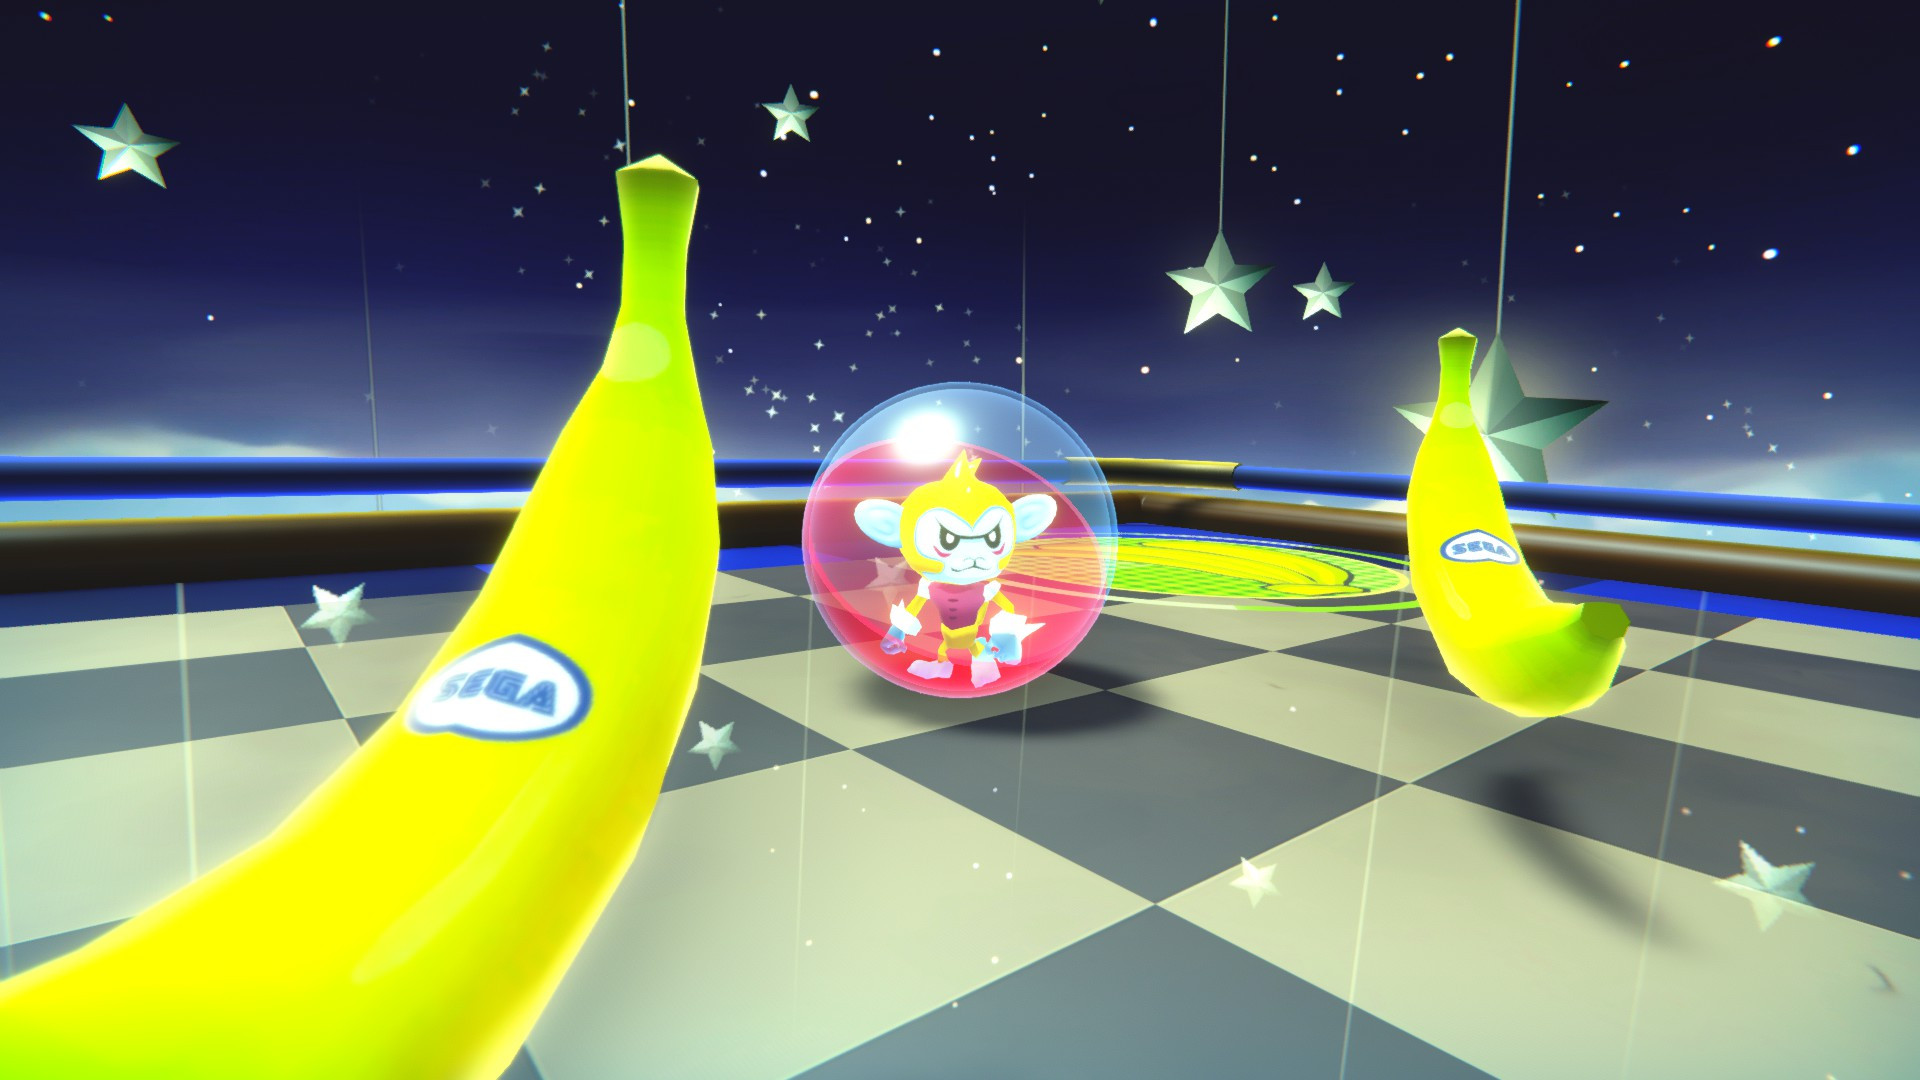 Super Monkey Ball Banana Mania - Game Config Visual Quality Settings - • The Modding Scene [WIP] - FFDEA1F